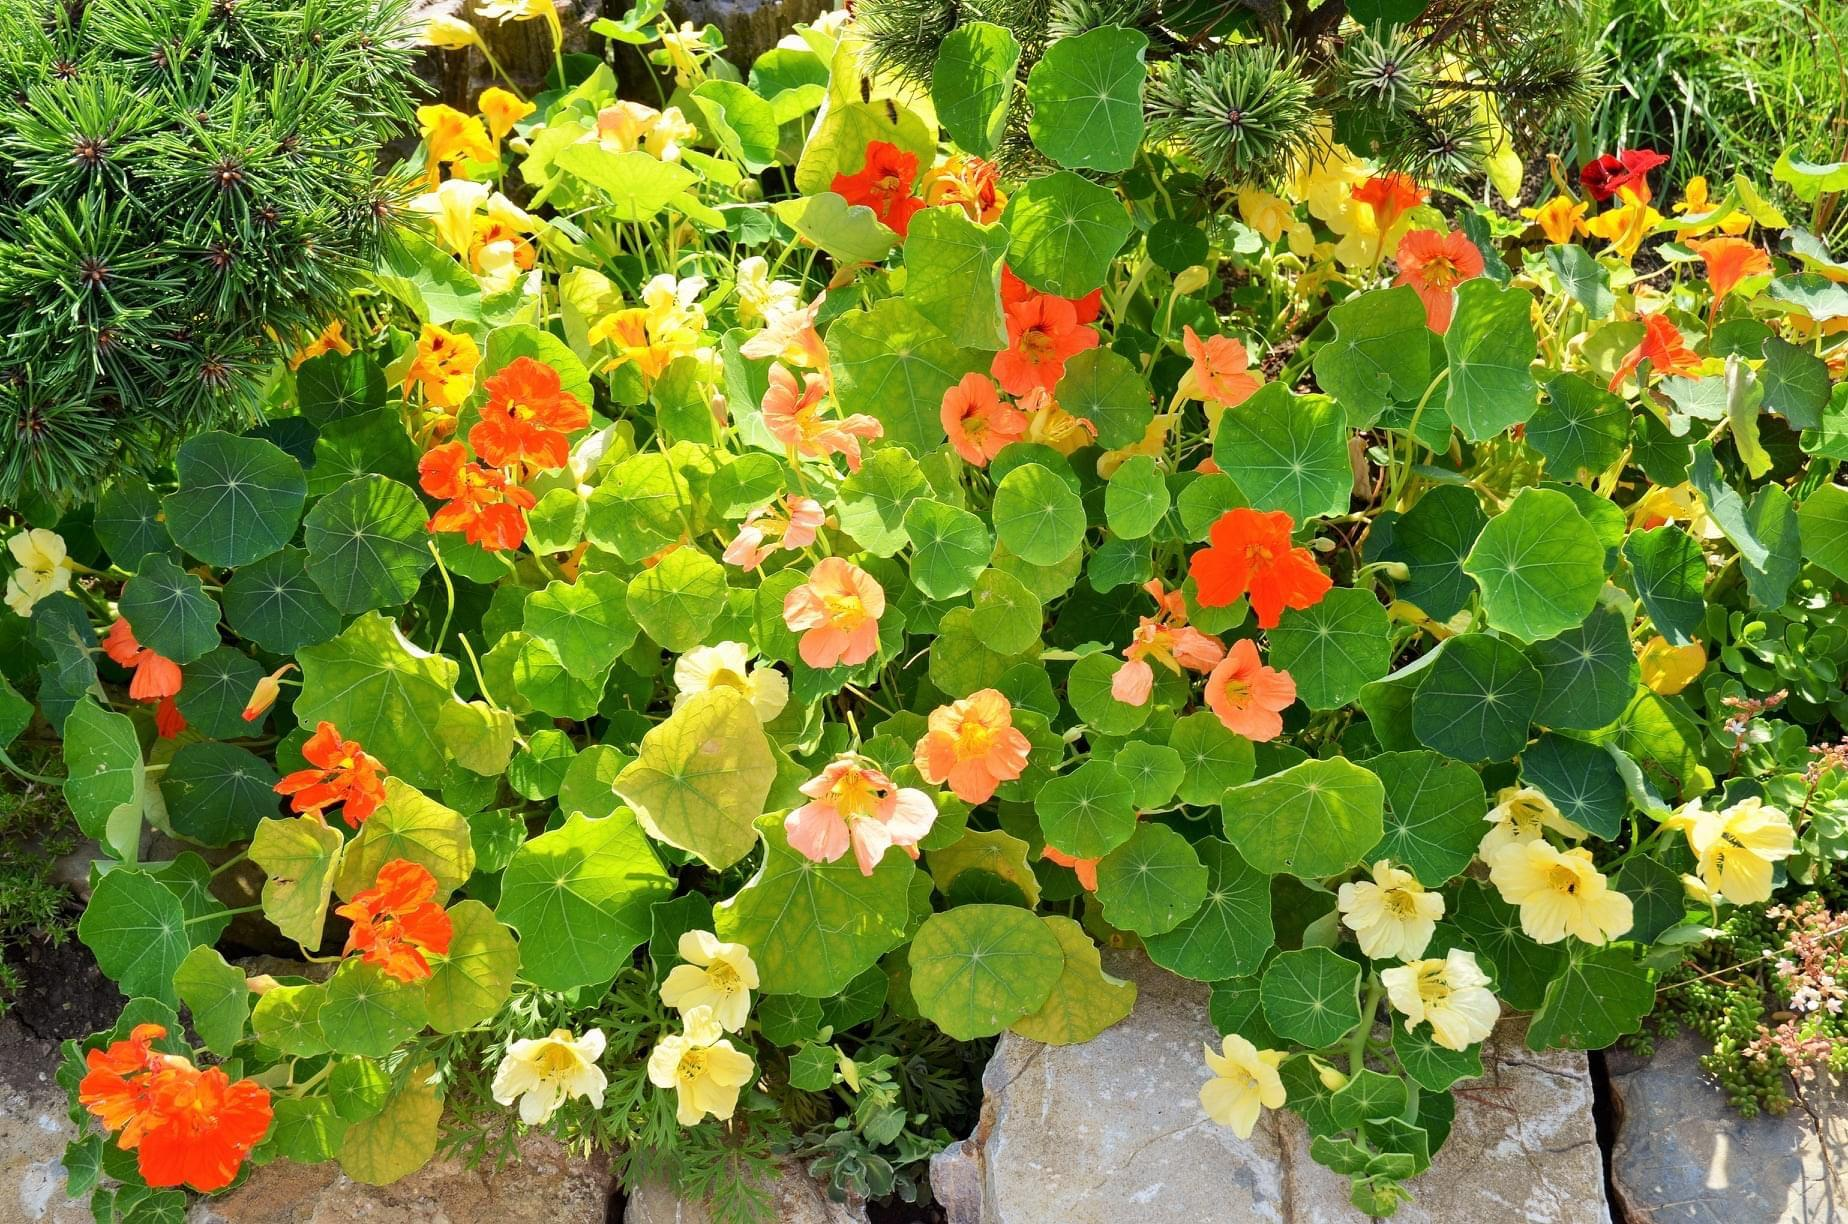 Zahrada - Obrázek č. 66